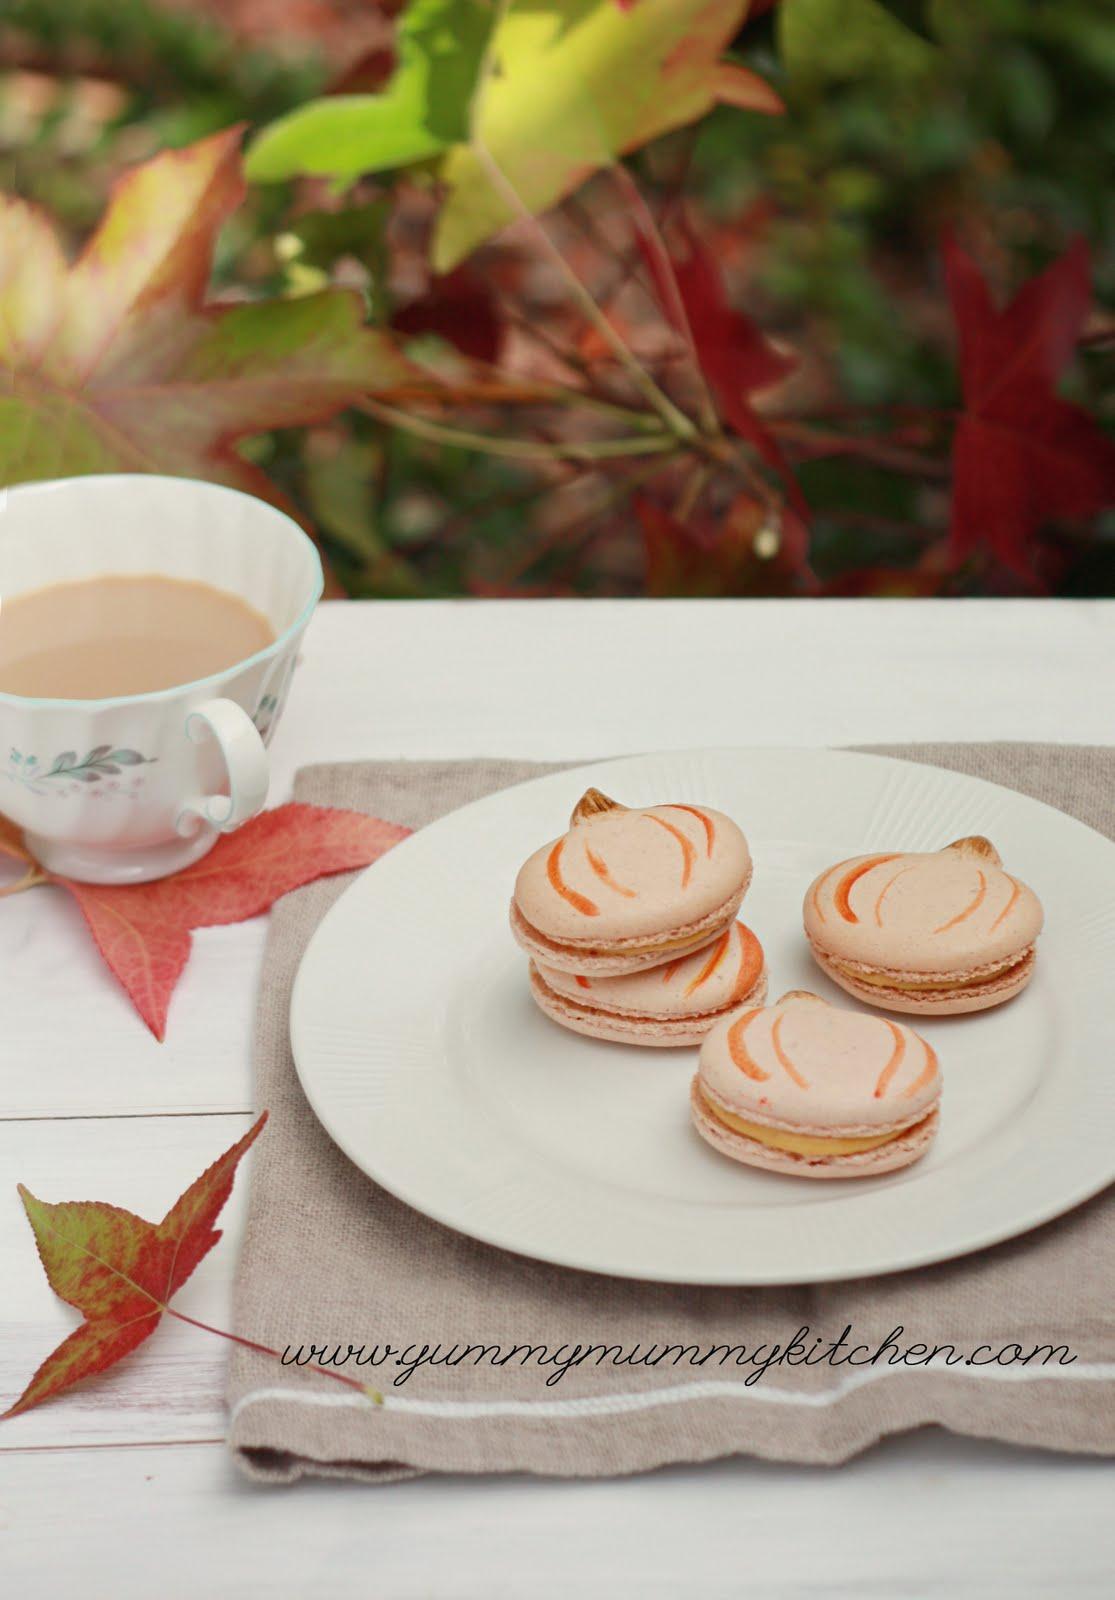 Pumpkin French Macarons | Yummy Mummy Kitchen | A Vibrant Vegetarian ...